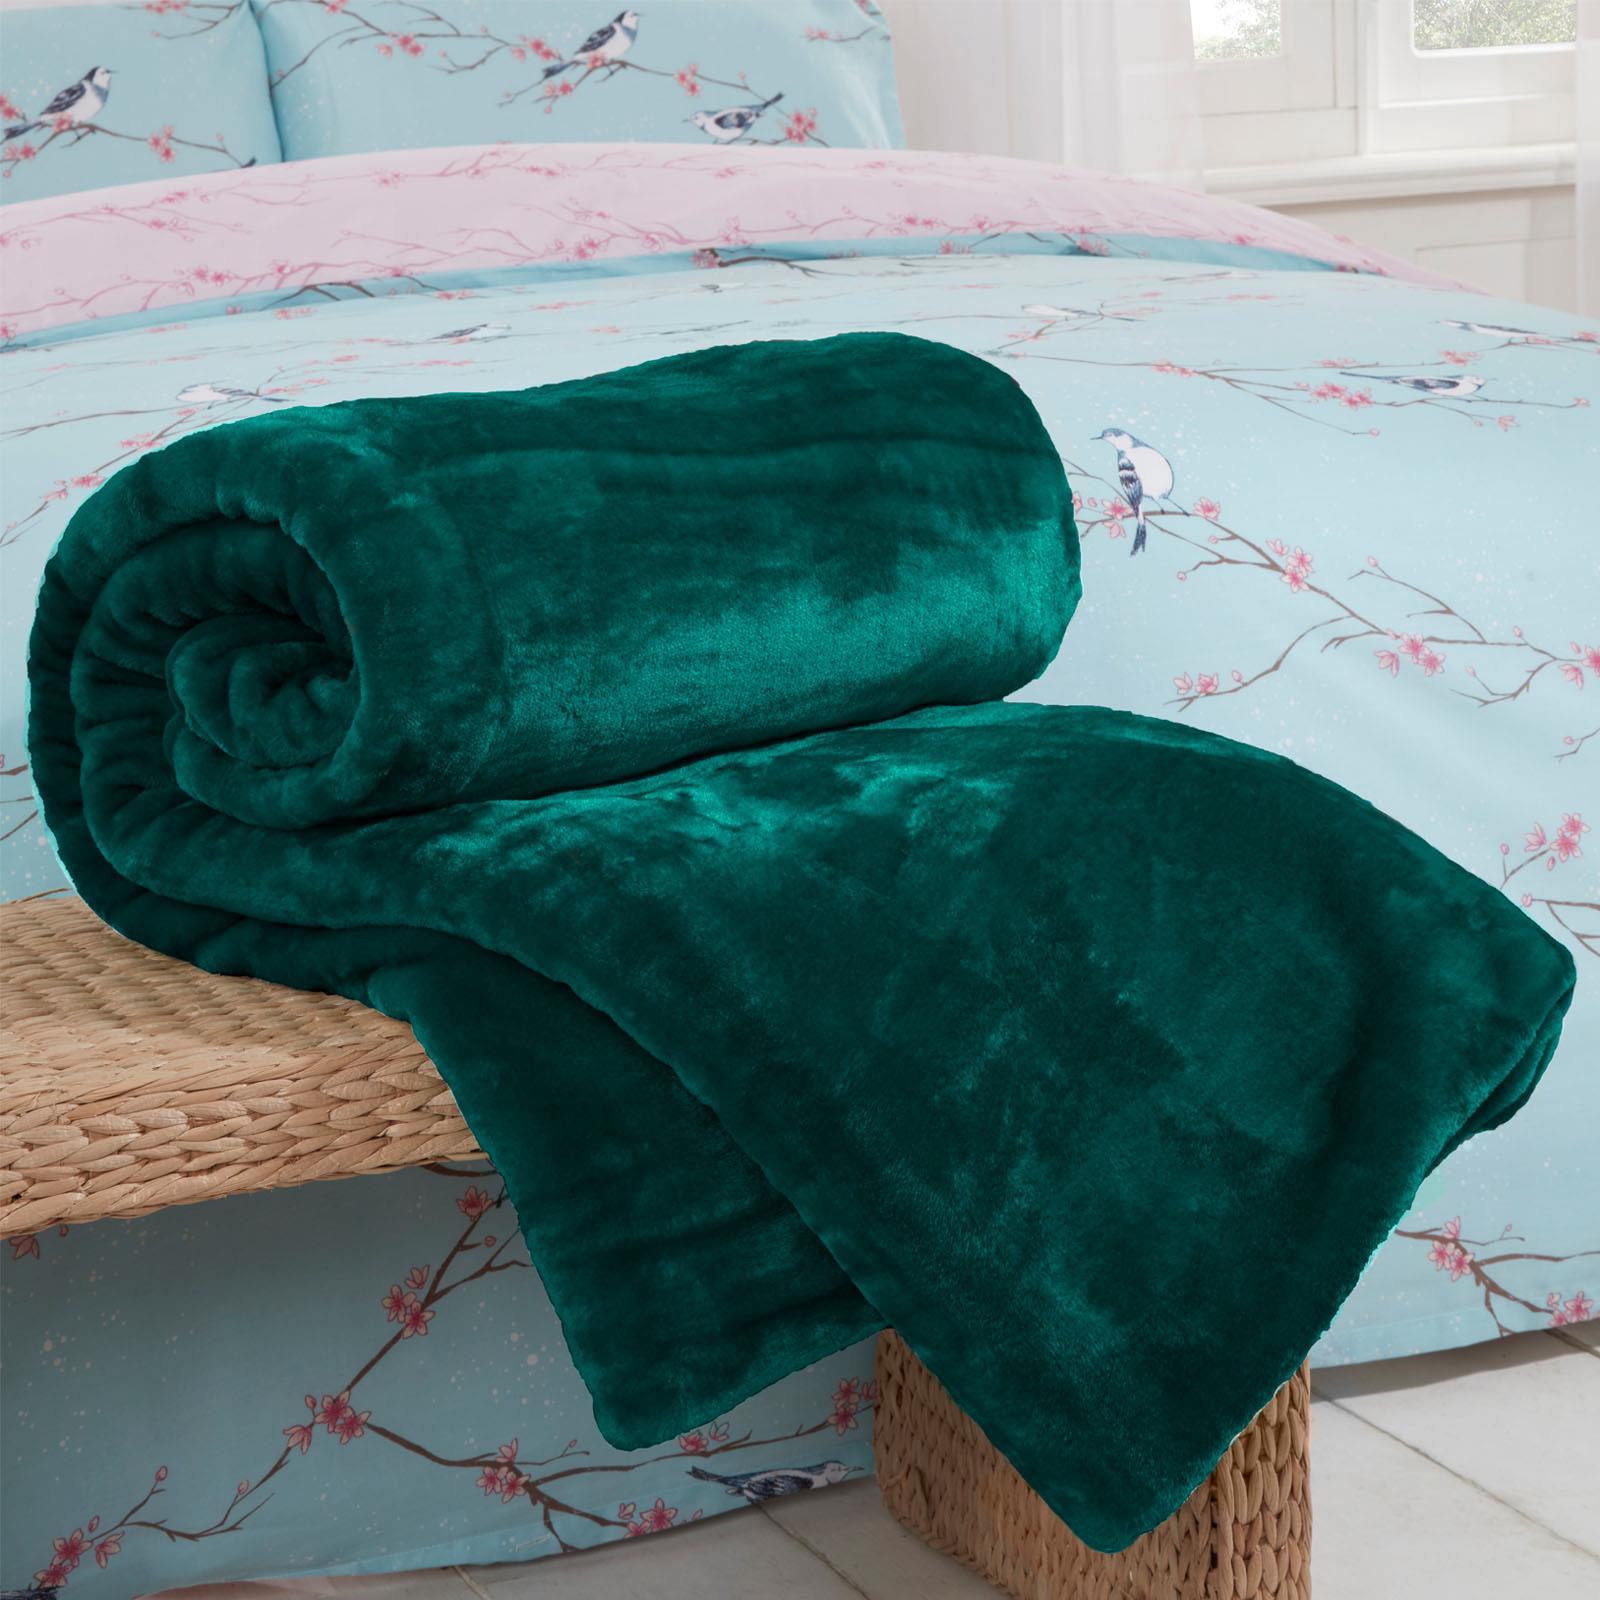 thumbnail 8 - Dreamscene Large Luxury Faux Fur Throw Sofa Bed Mink Soft Warm Fleece Blanket